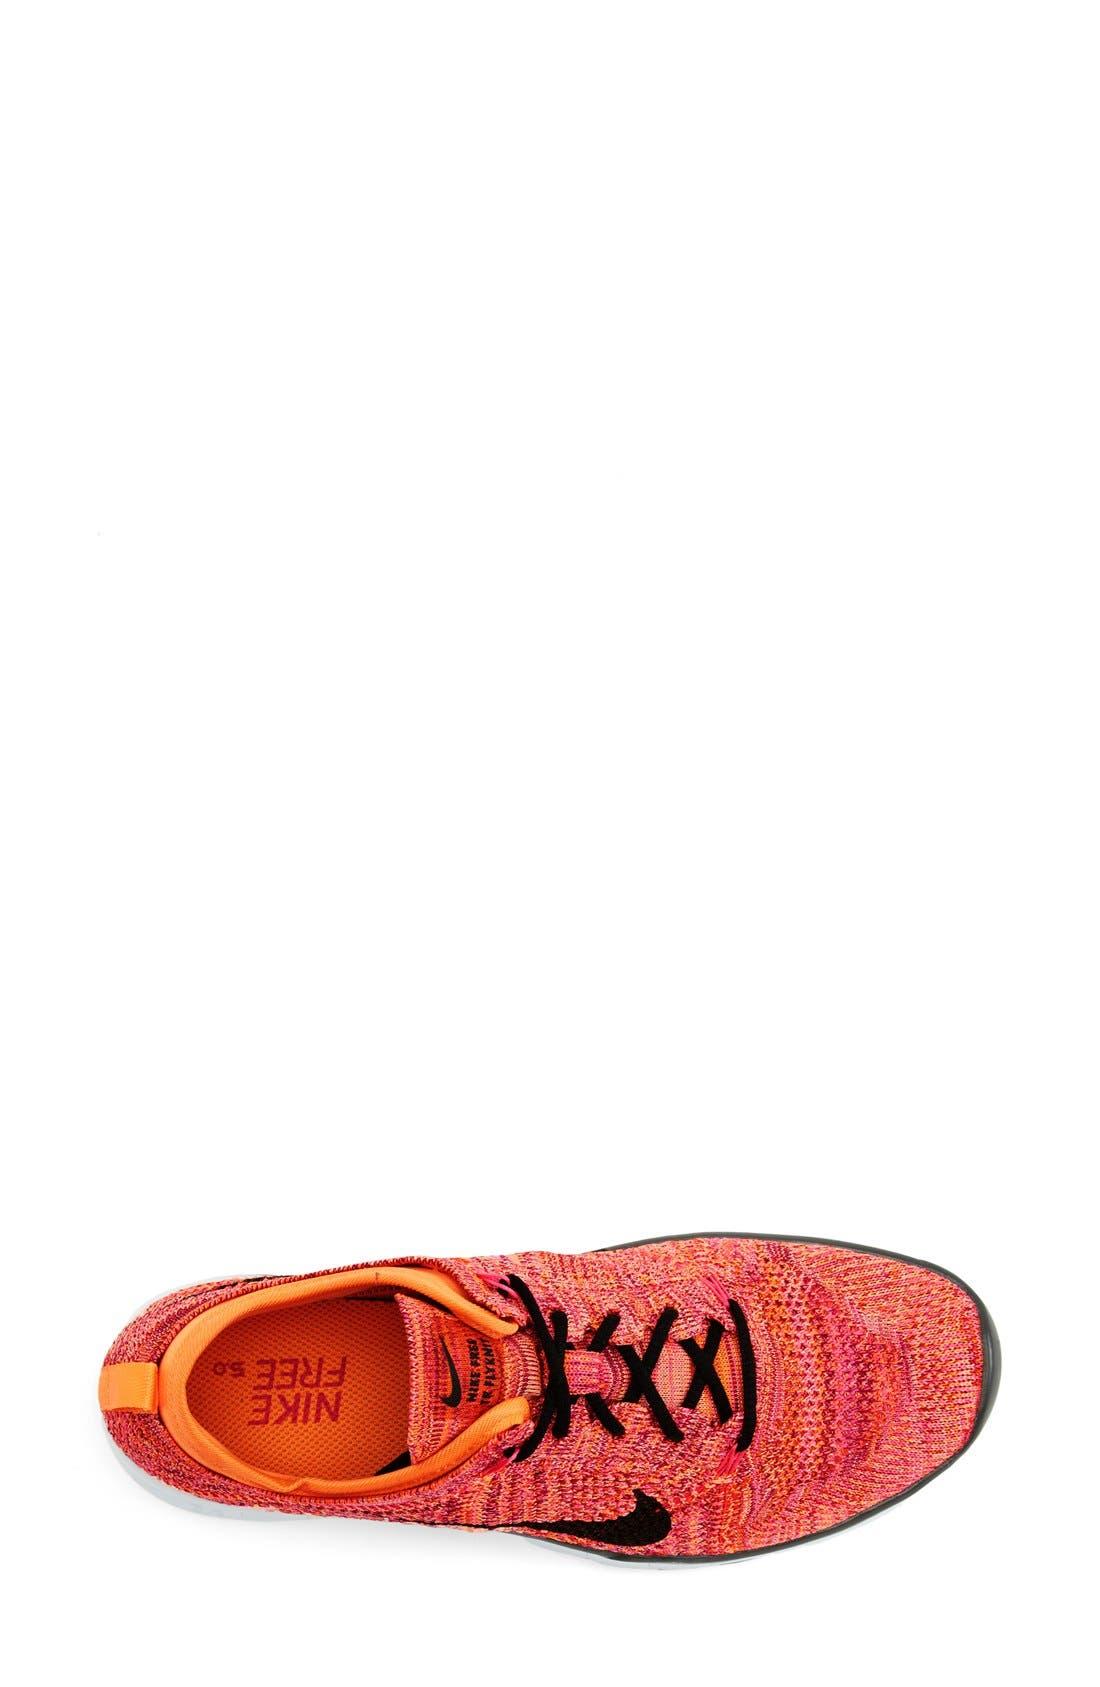 ,                             'Free Flyknit 5.0 TR' Training Shoe,                             Alternate thumbnail 58, color,                             800